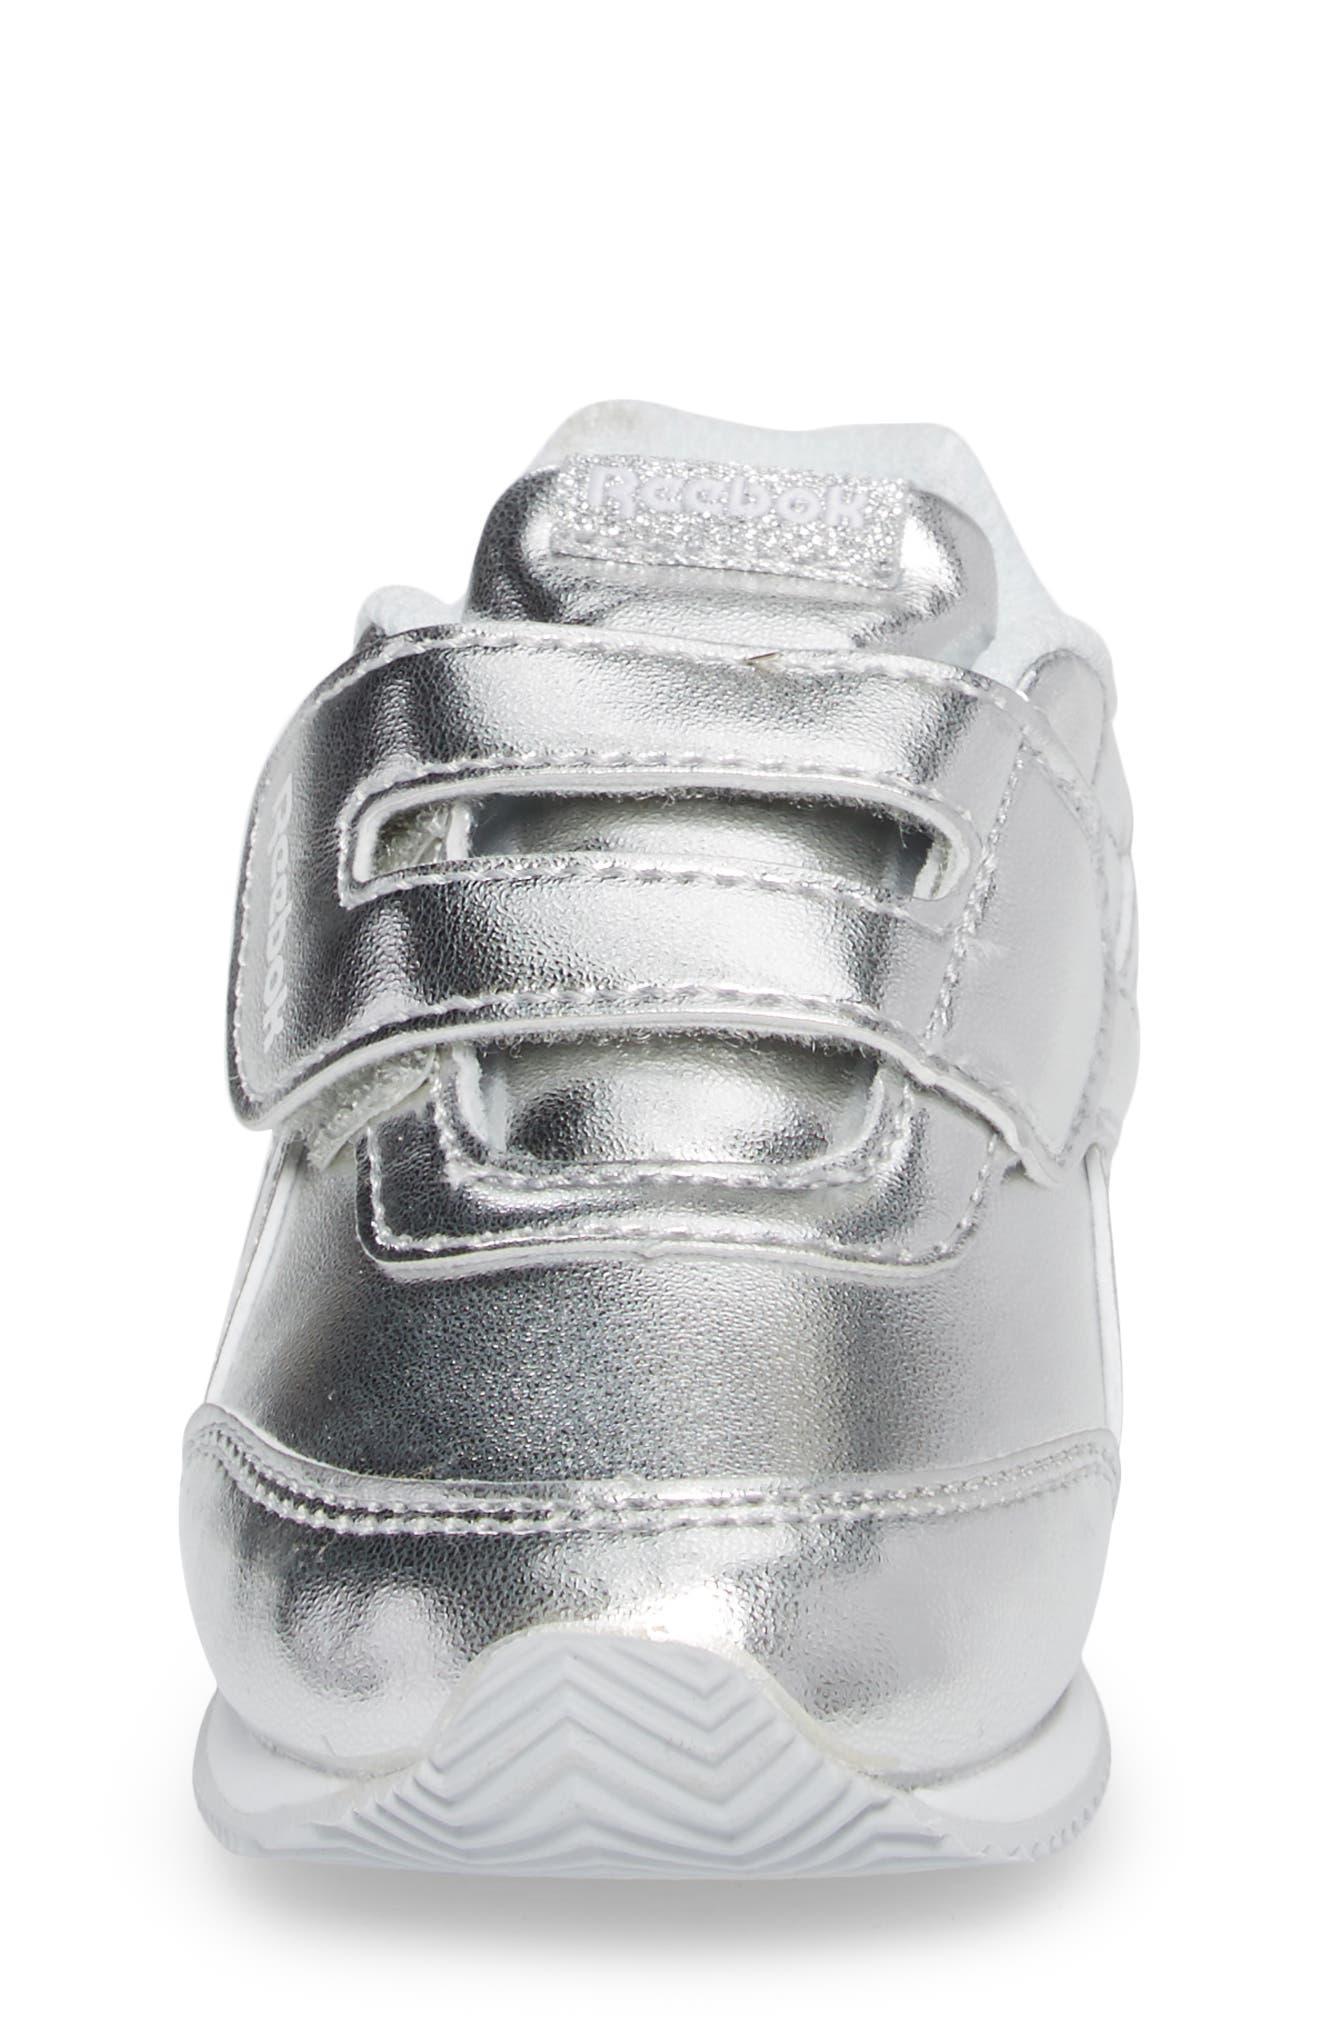 Royal Classic Jogger 2 Sneaker,                             Alternate thumbnail 4, color,                             040